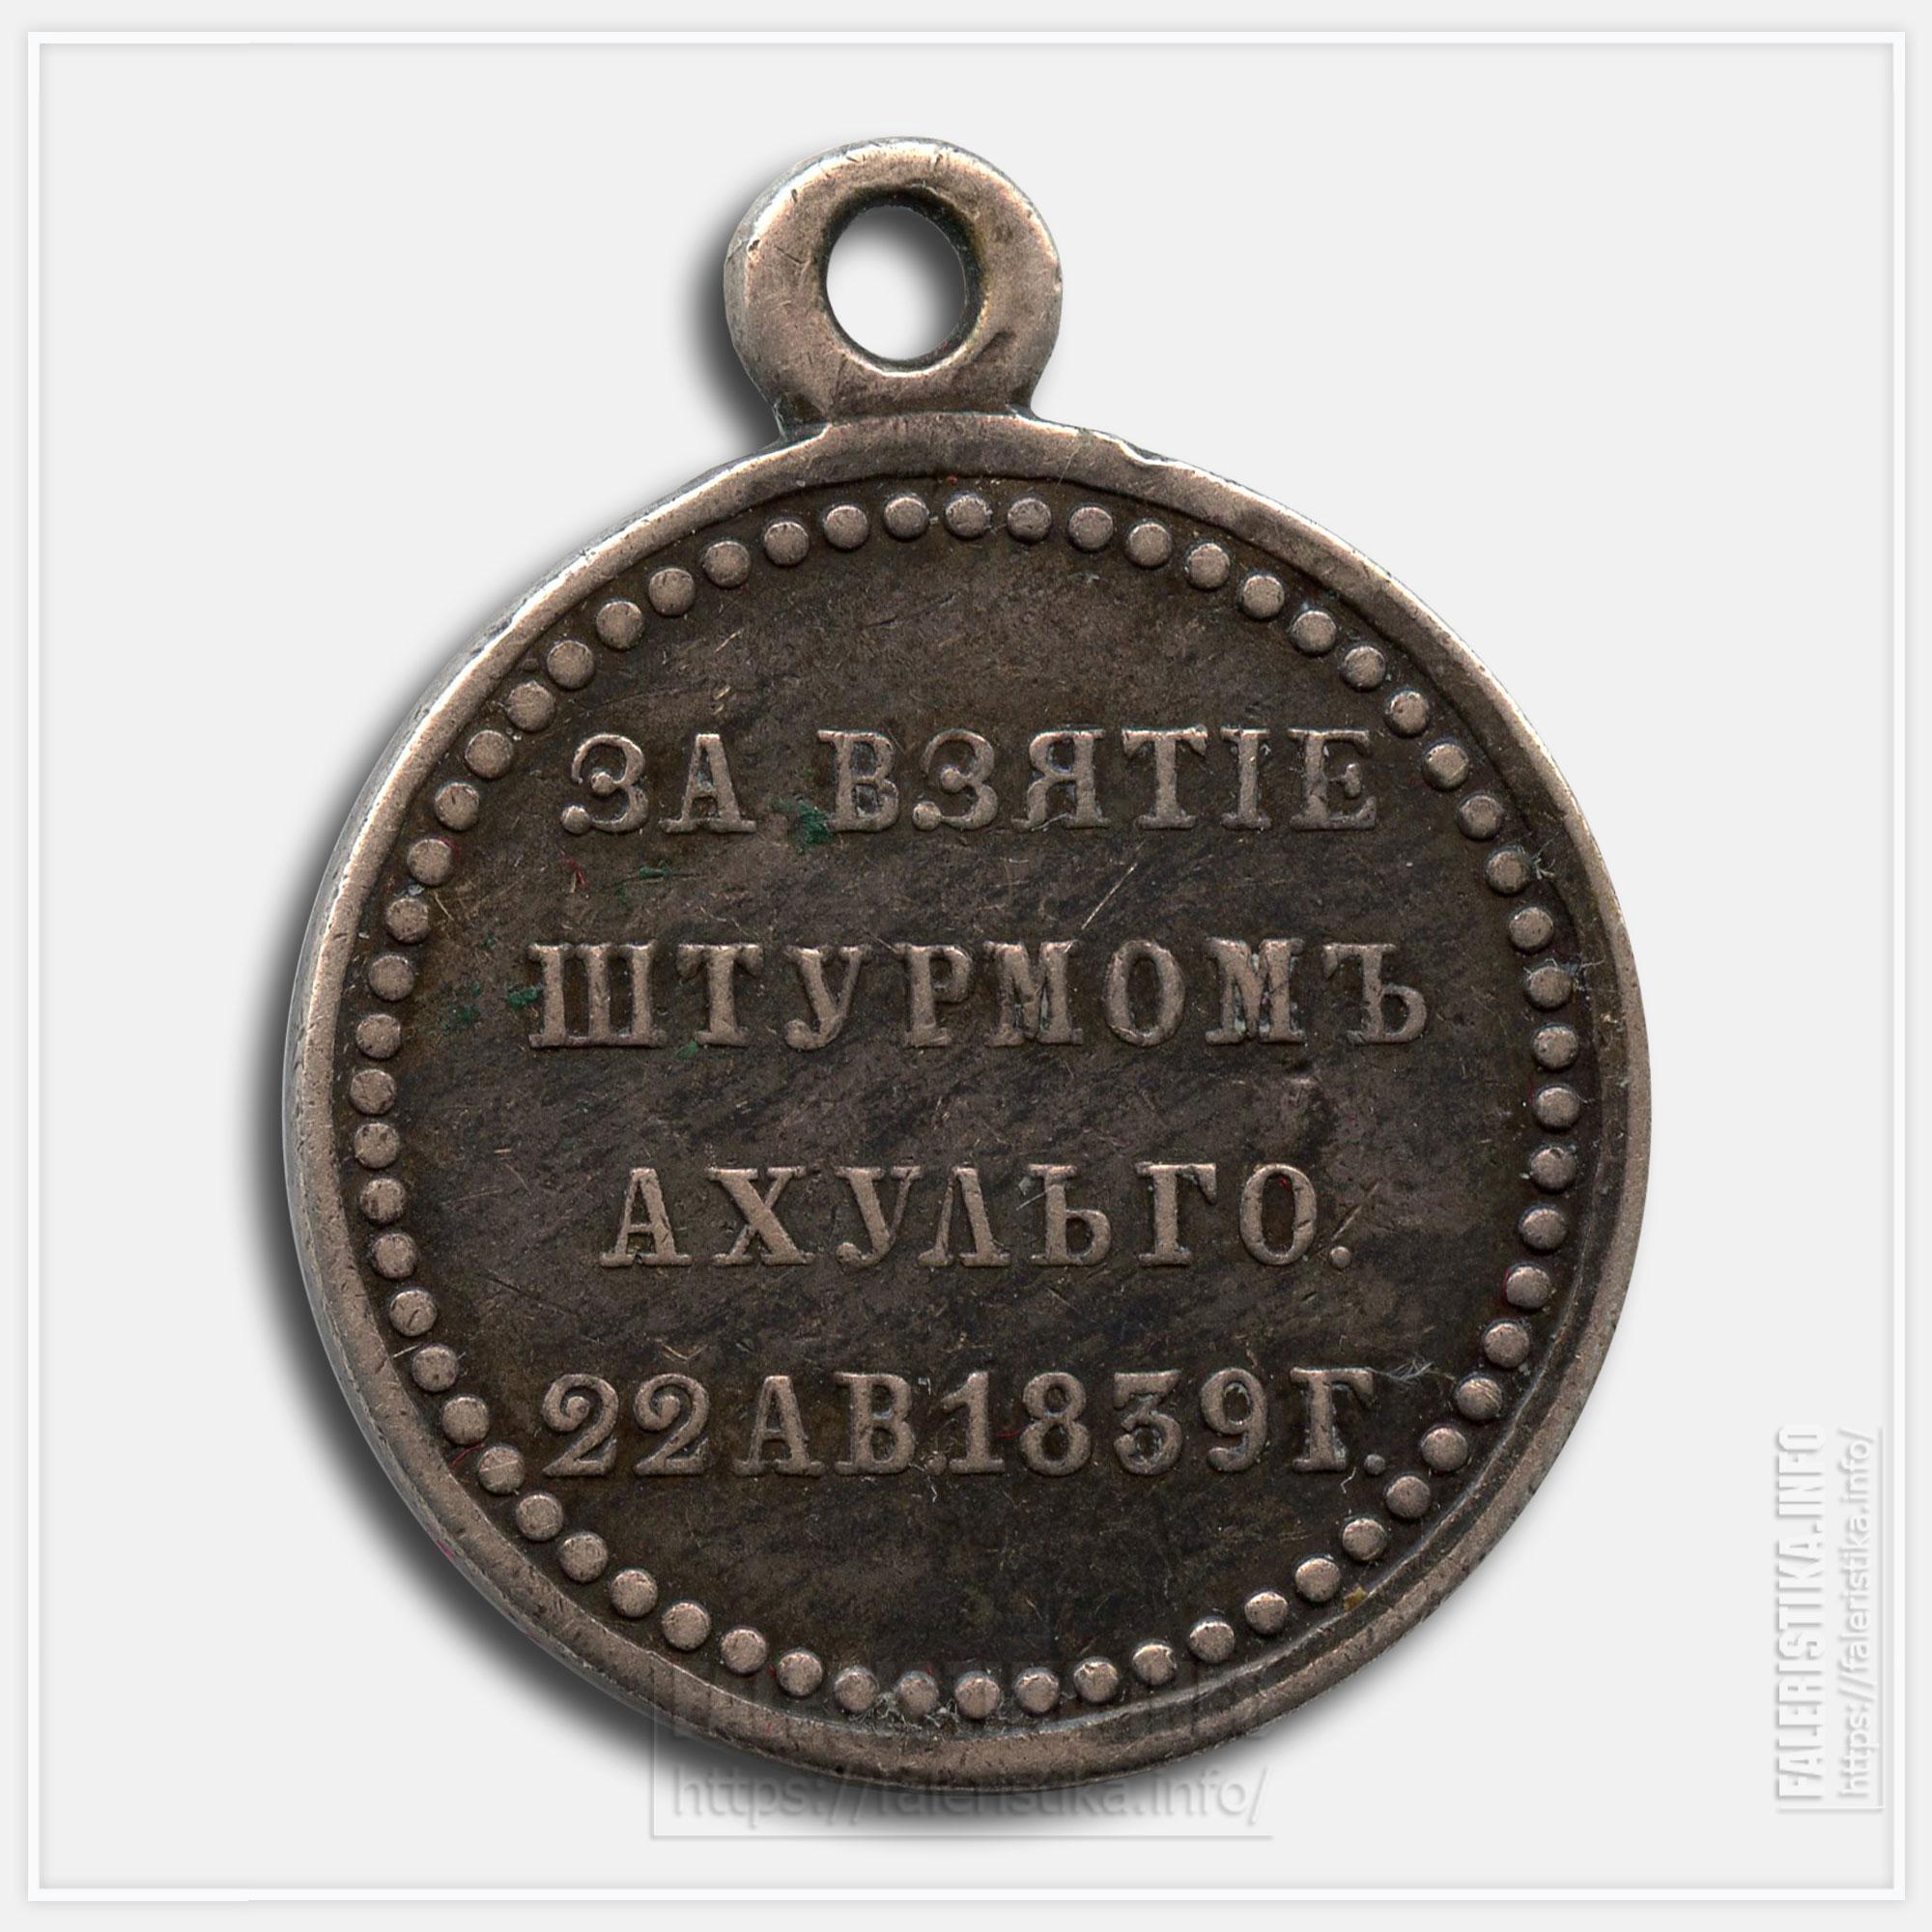 Медаль «За взятие штурмом Ахульго 1839»